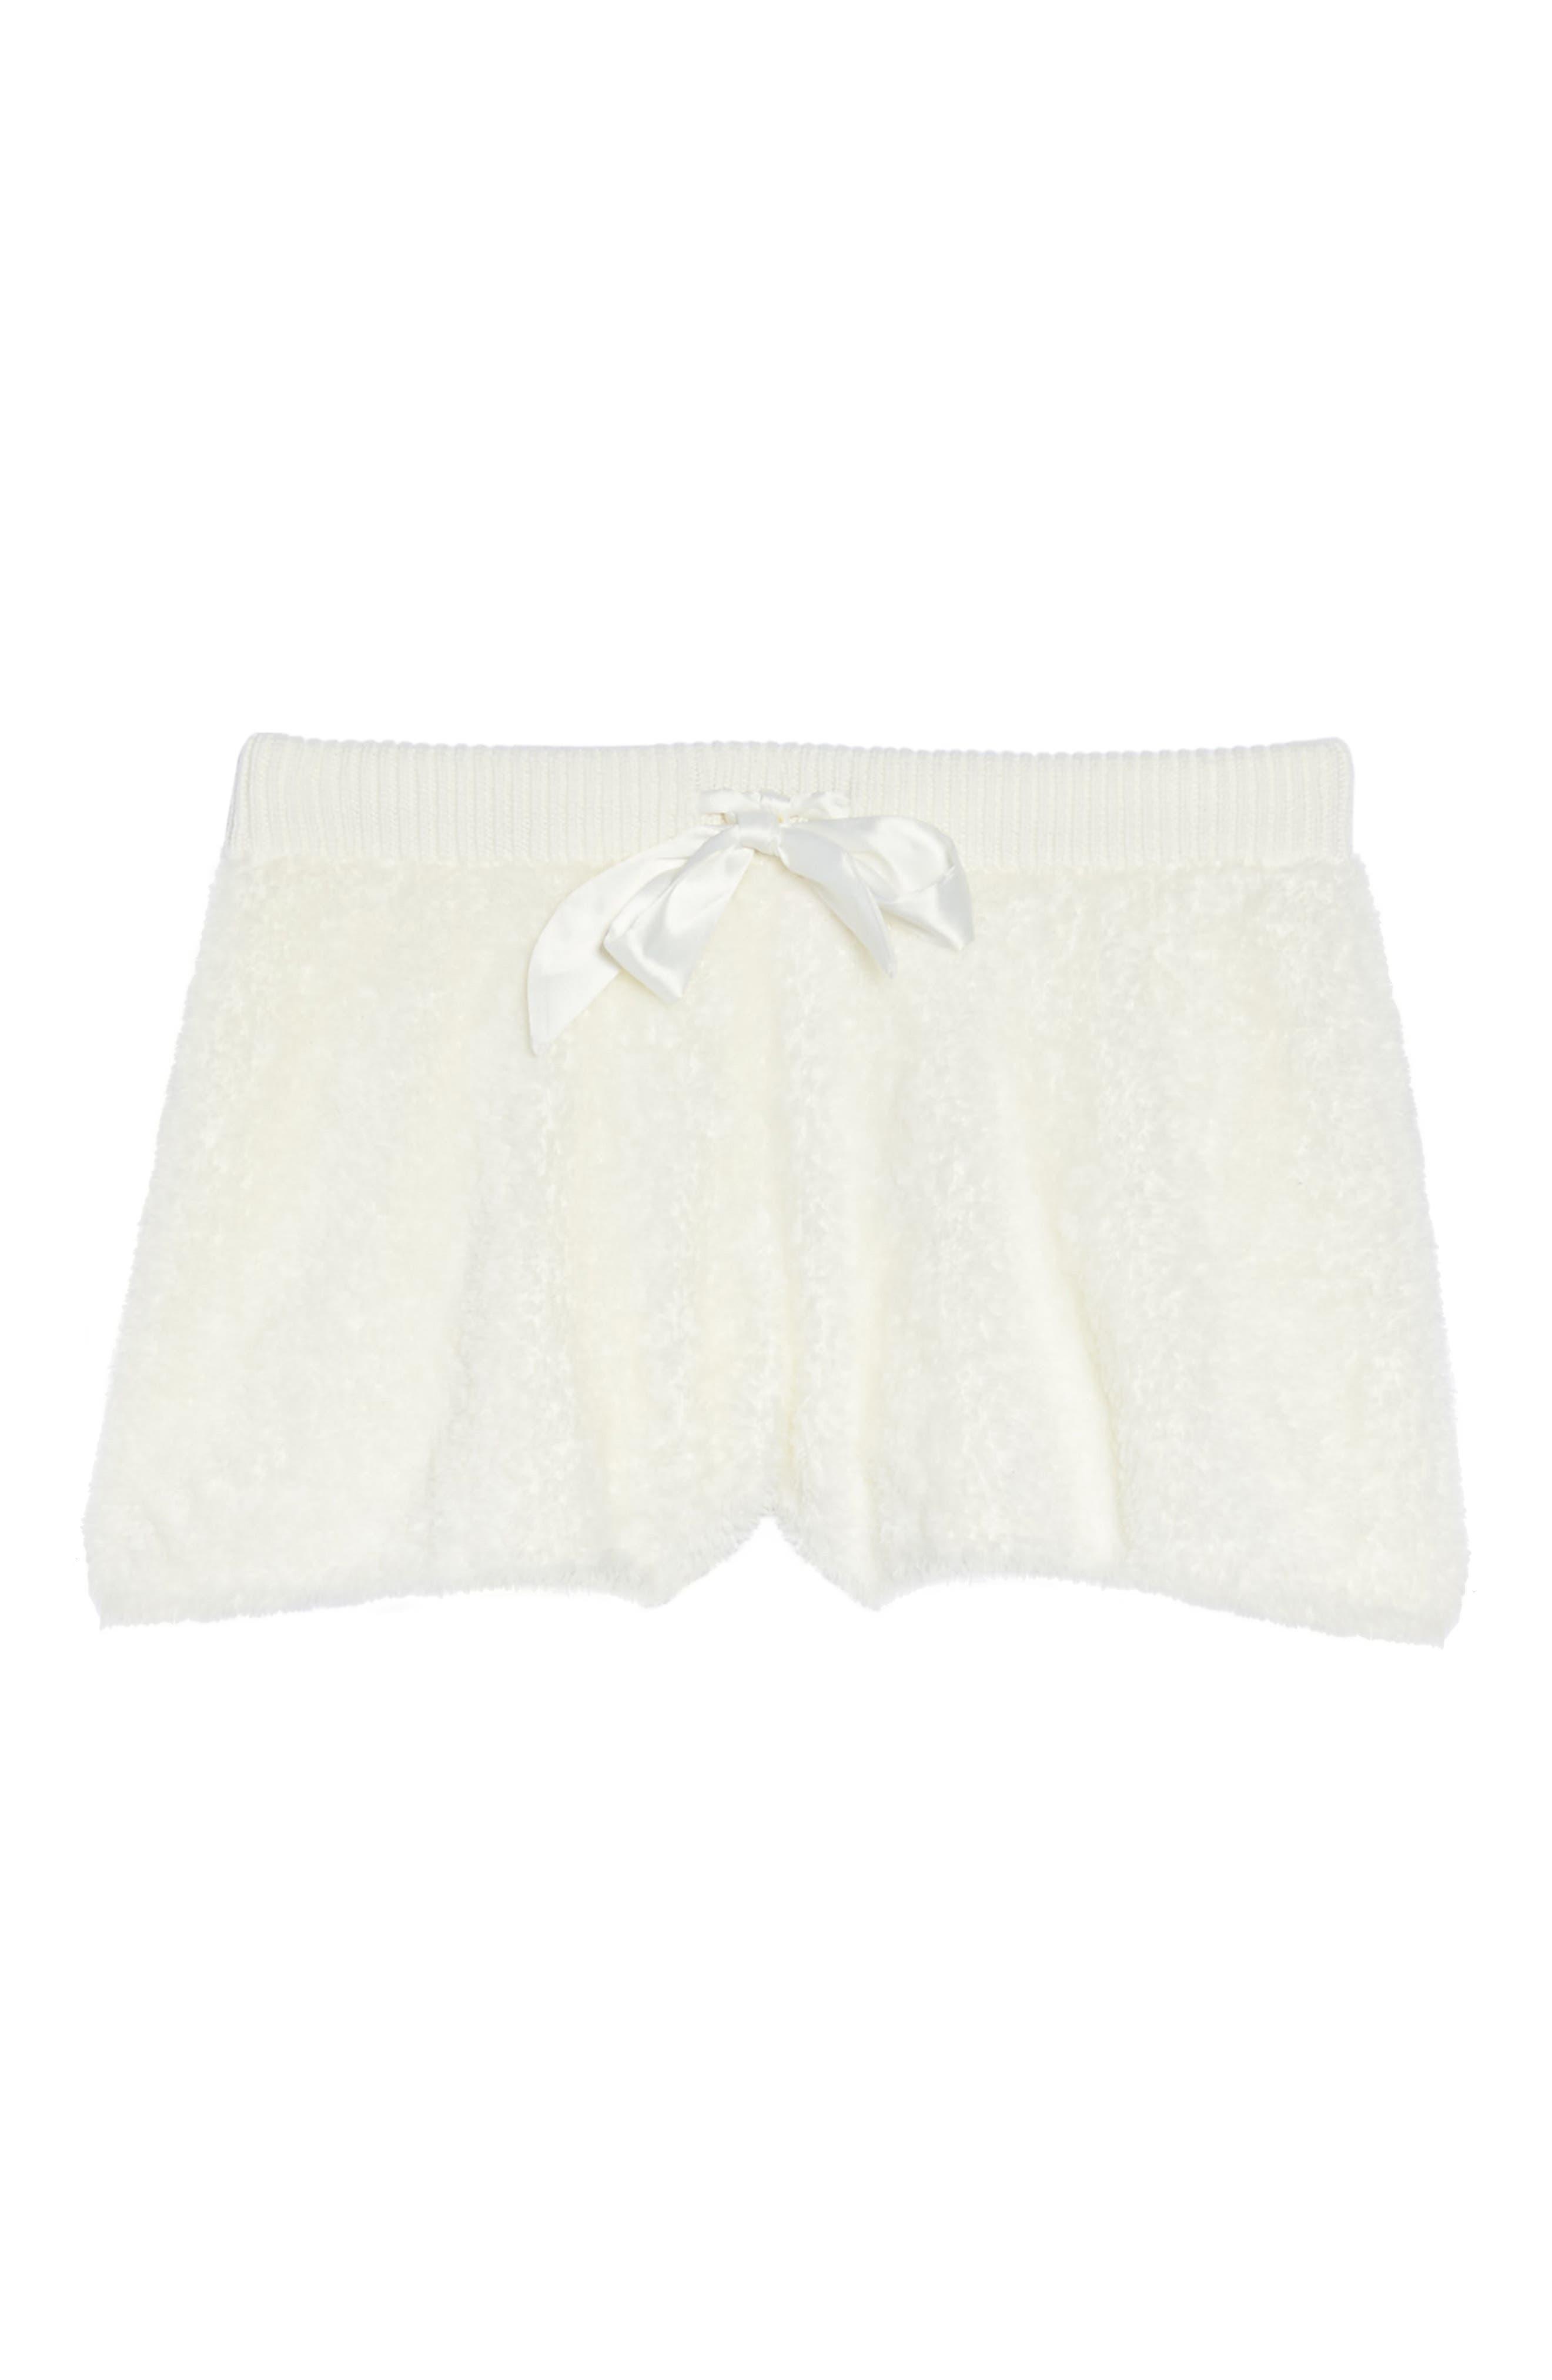 Fuzzy Lounge Shorts,                             Alternate thumbnail 32, color,